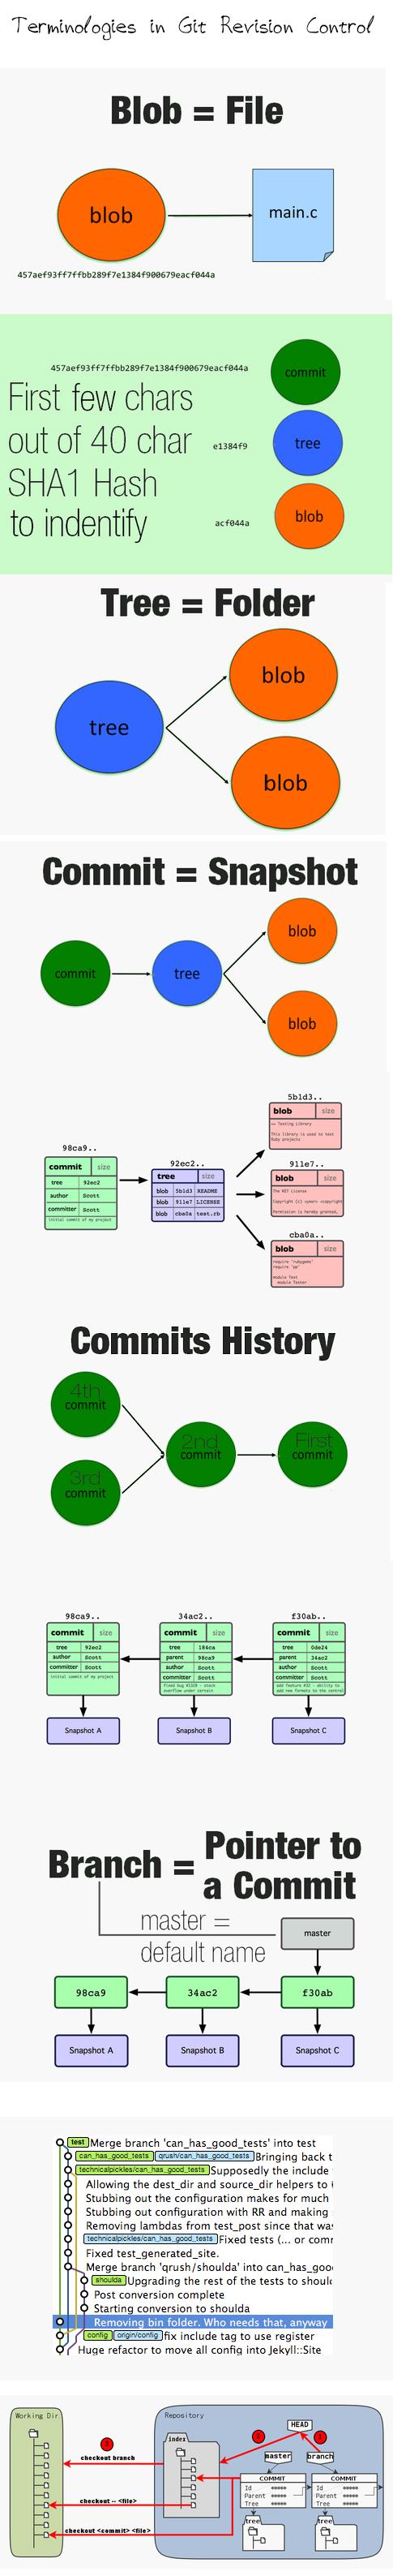 Common-Terminologies-in-Revision-Control